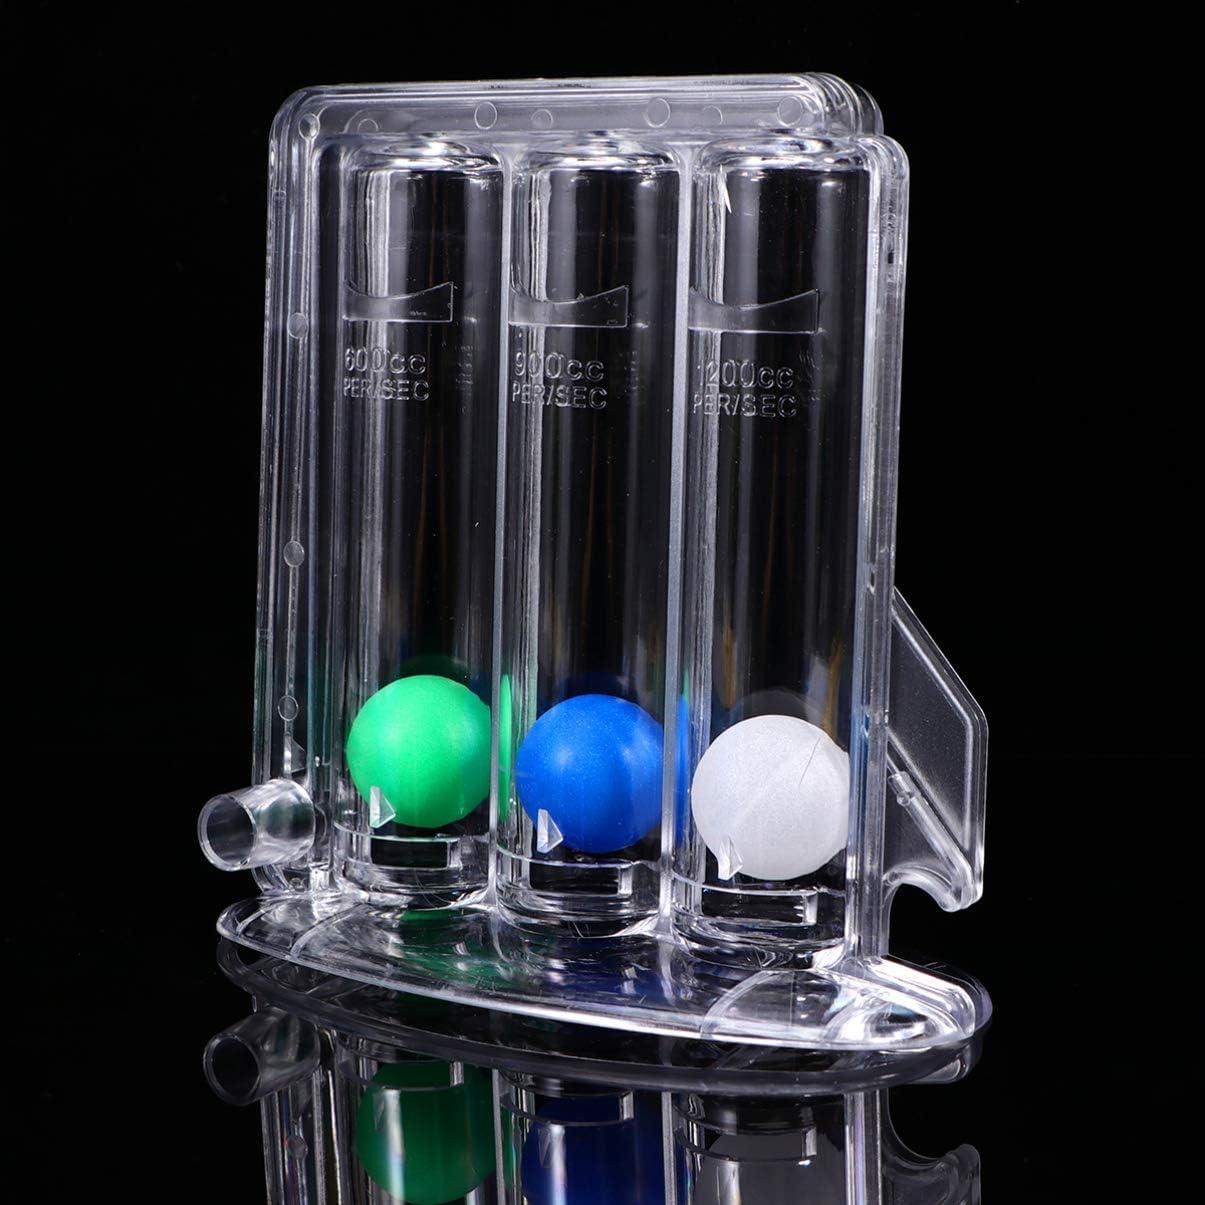 Atemtrainingsger/ät Atemtrainingsger/ät Vitalkapazit/ät Drei-Ball-Incentive-Trainingsger/ät Lungentrainingsger/ät f/ür zu Hause iplusmile Incentive-Spirometer